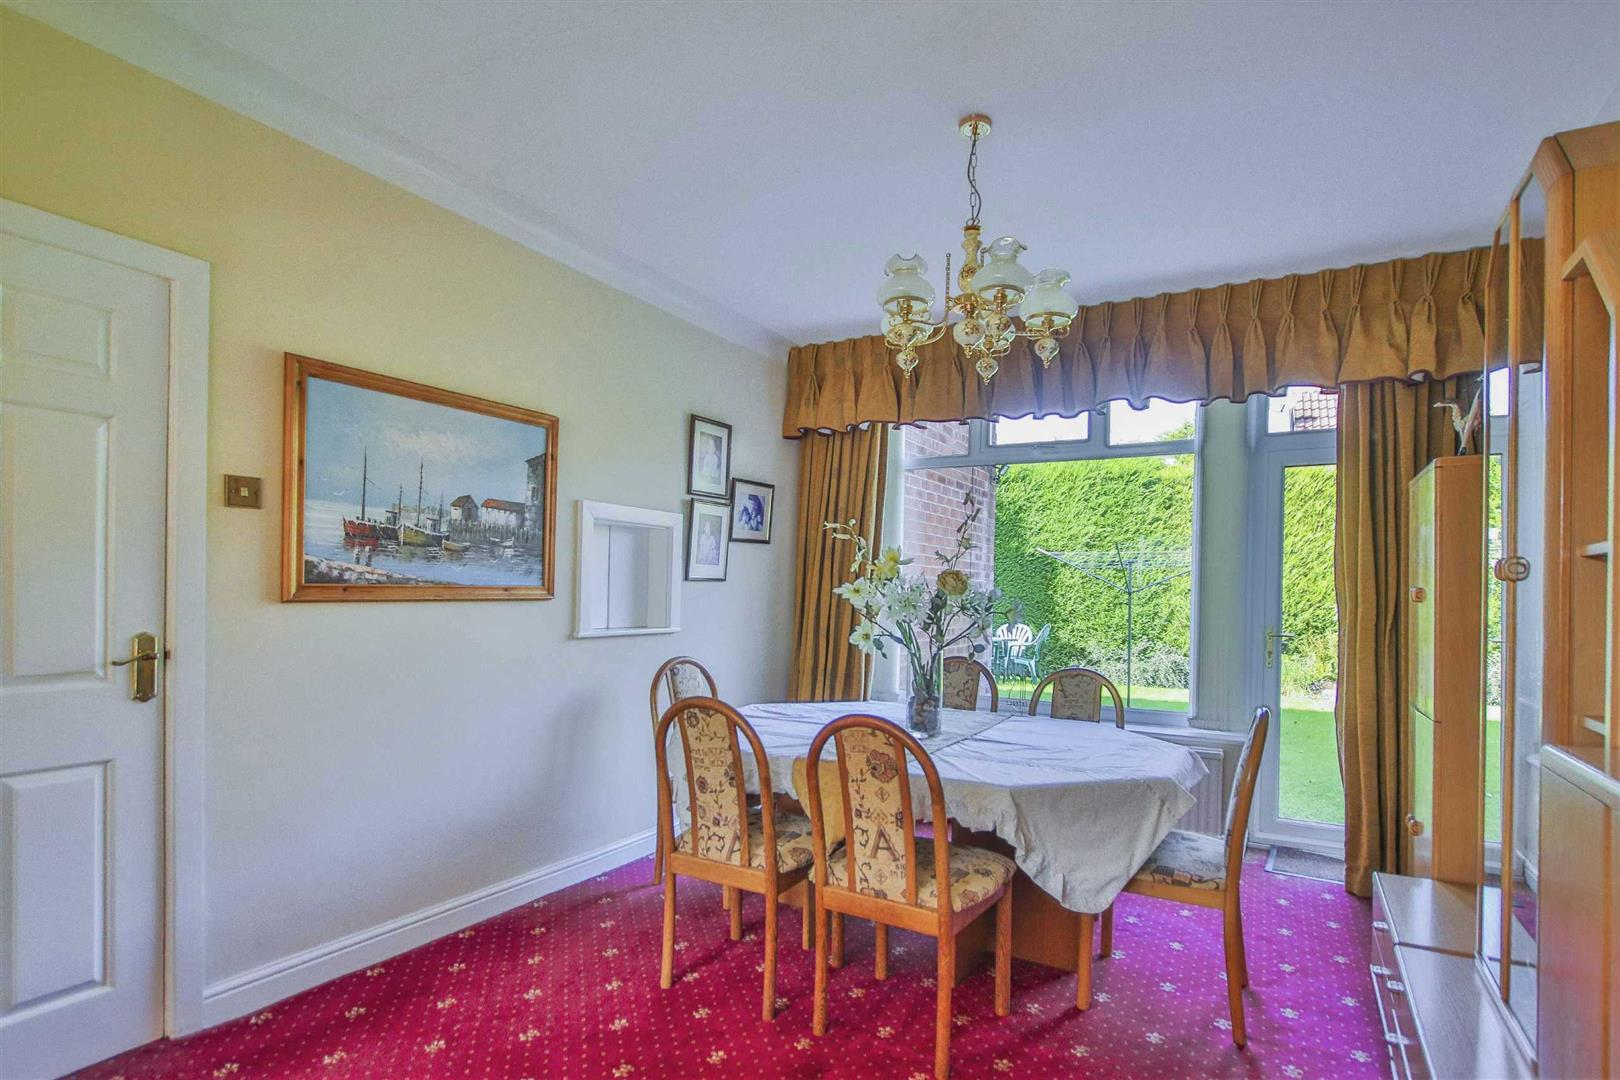 4 Bedroom Detached House For Sale - Image 23